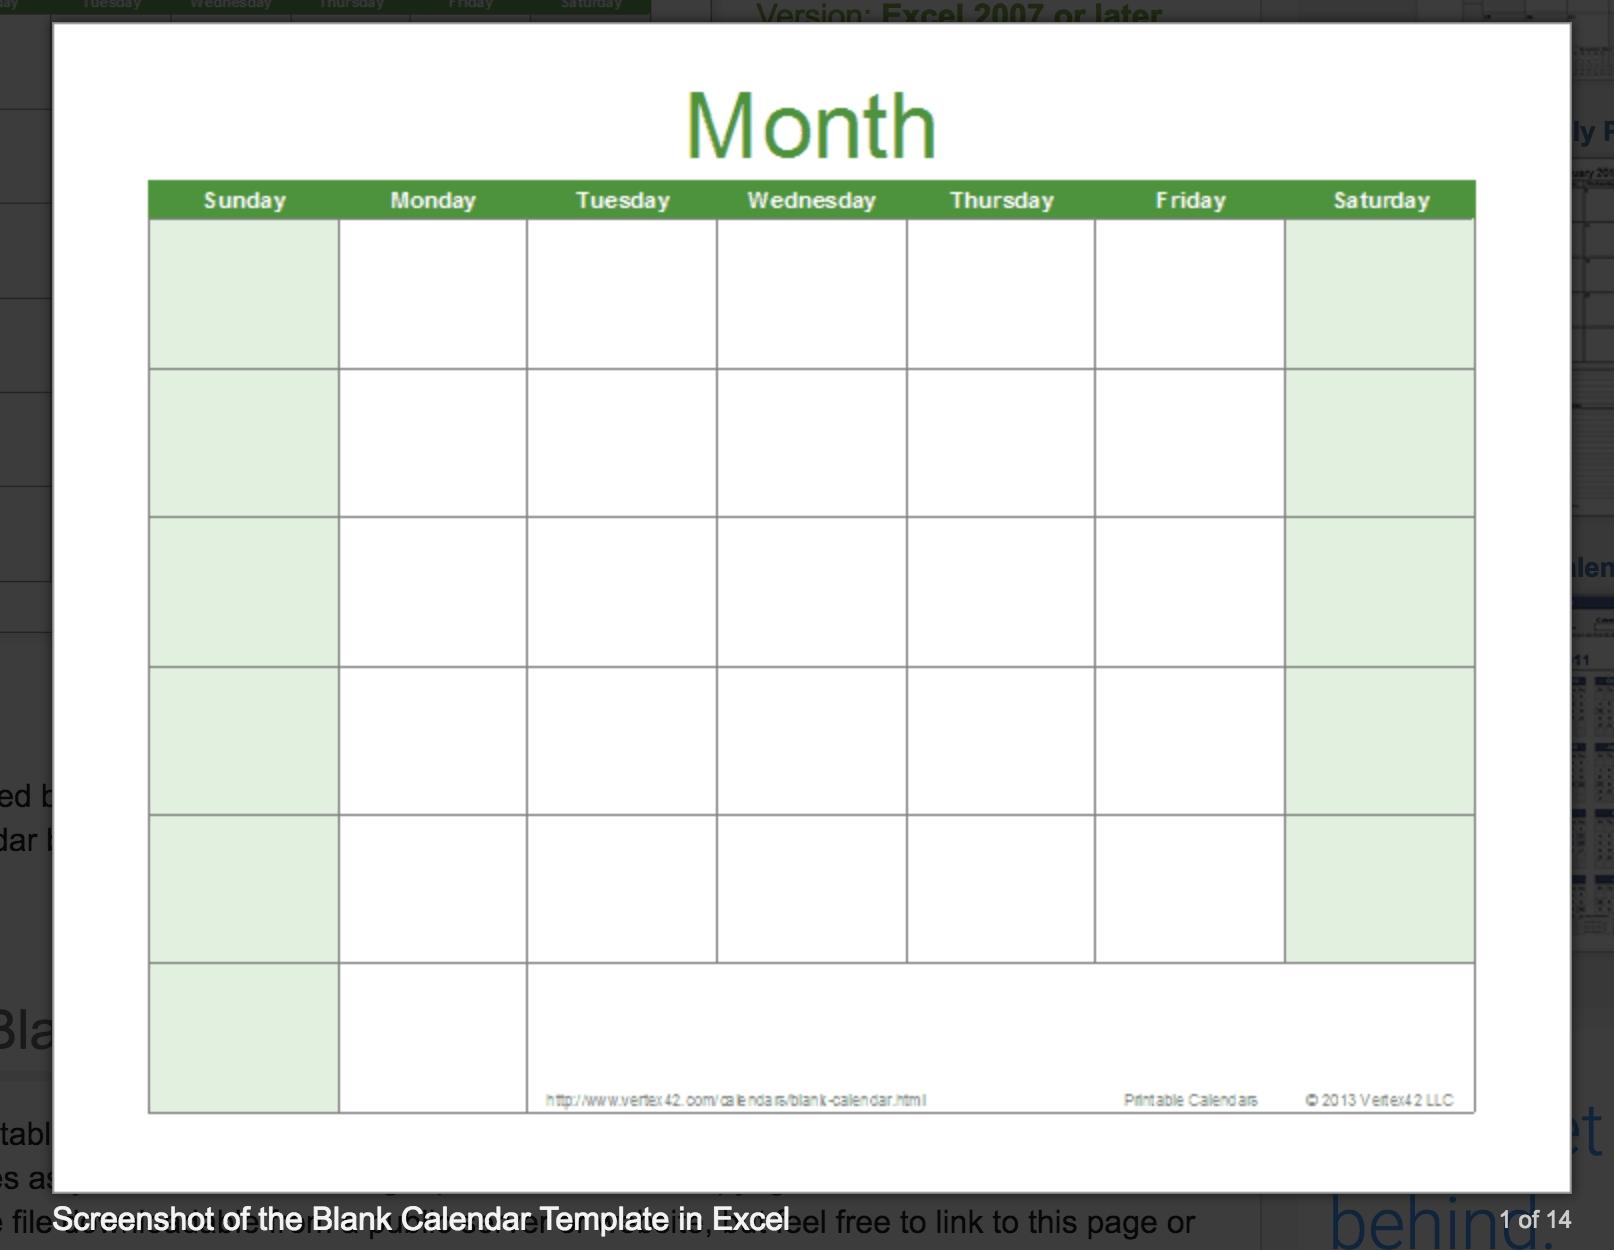 Blank Calendar: Wonderfully Printable 2019 Templates  1 Month Calendar Printable Blank